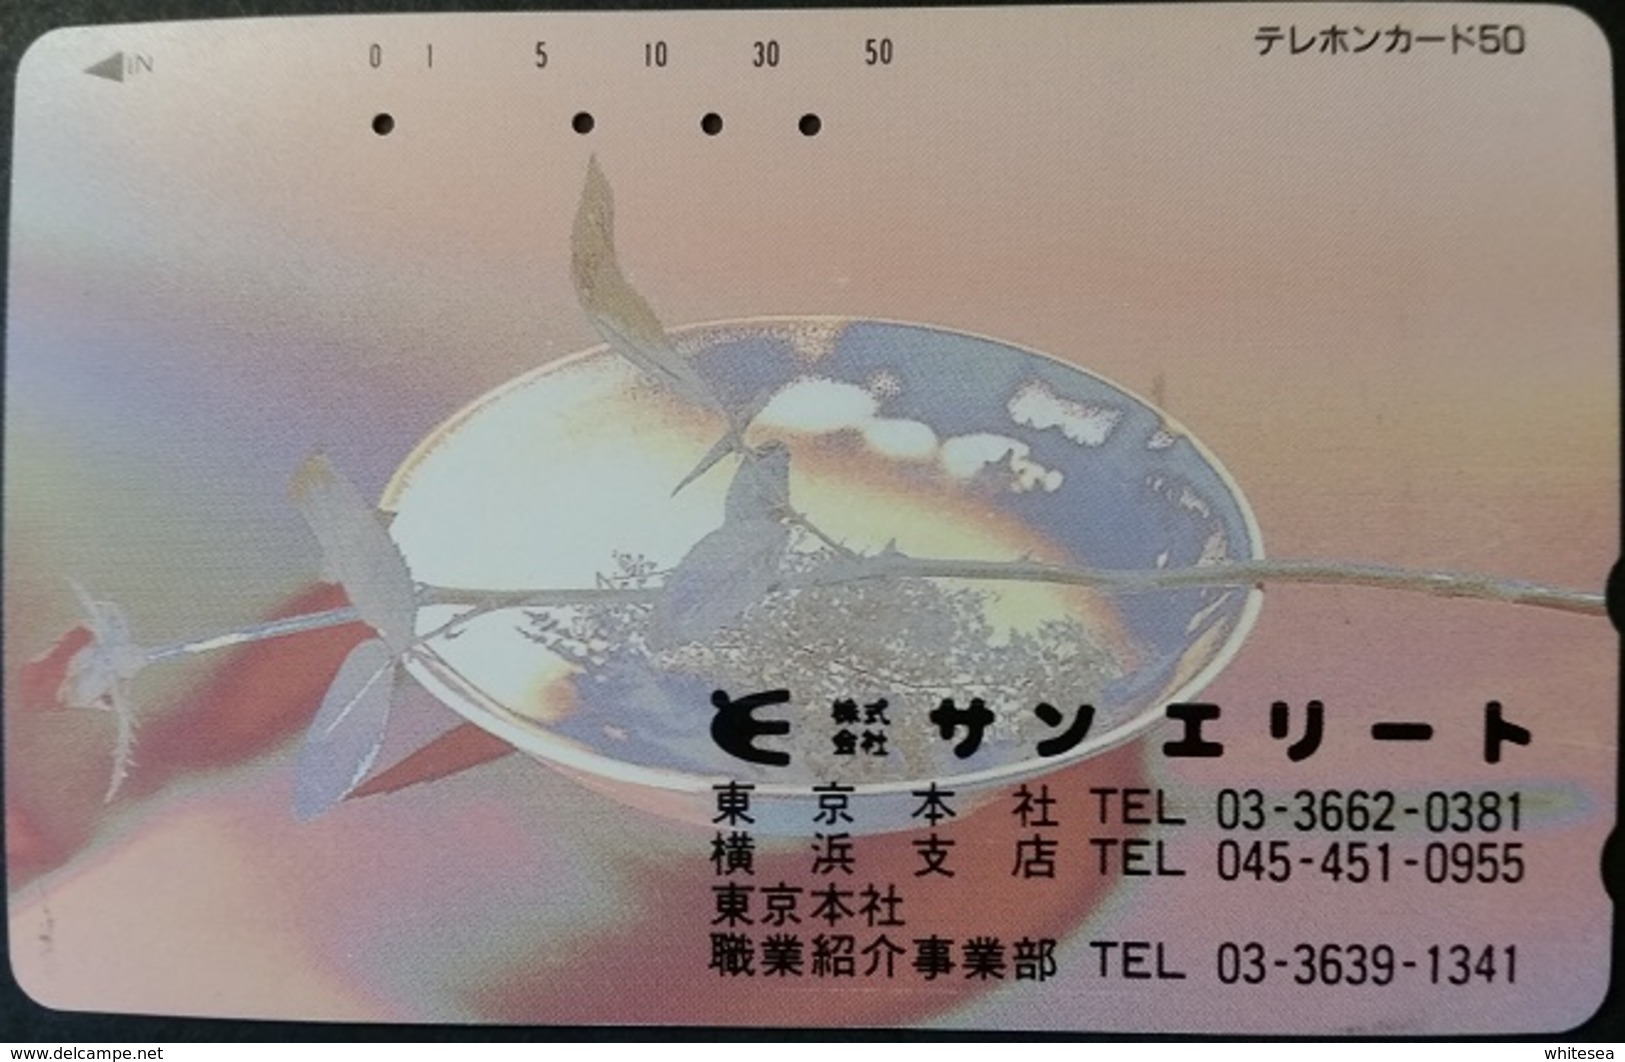 Telefonkarte Japan - Werbung -  Rose - 110-248 - Japan